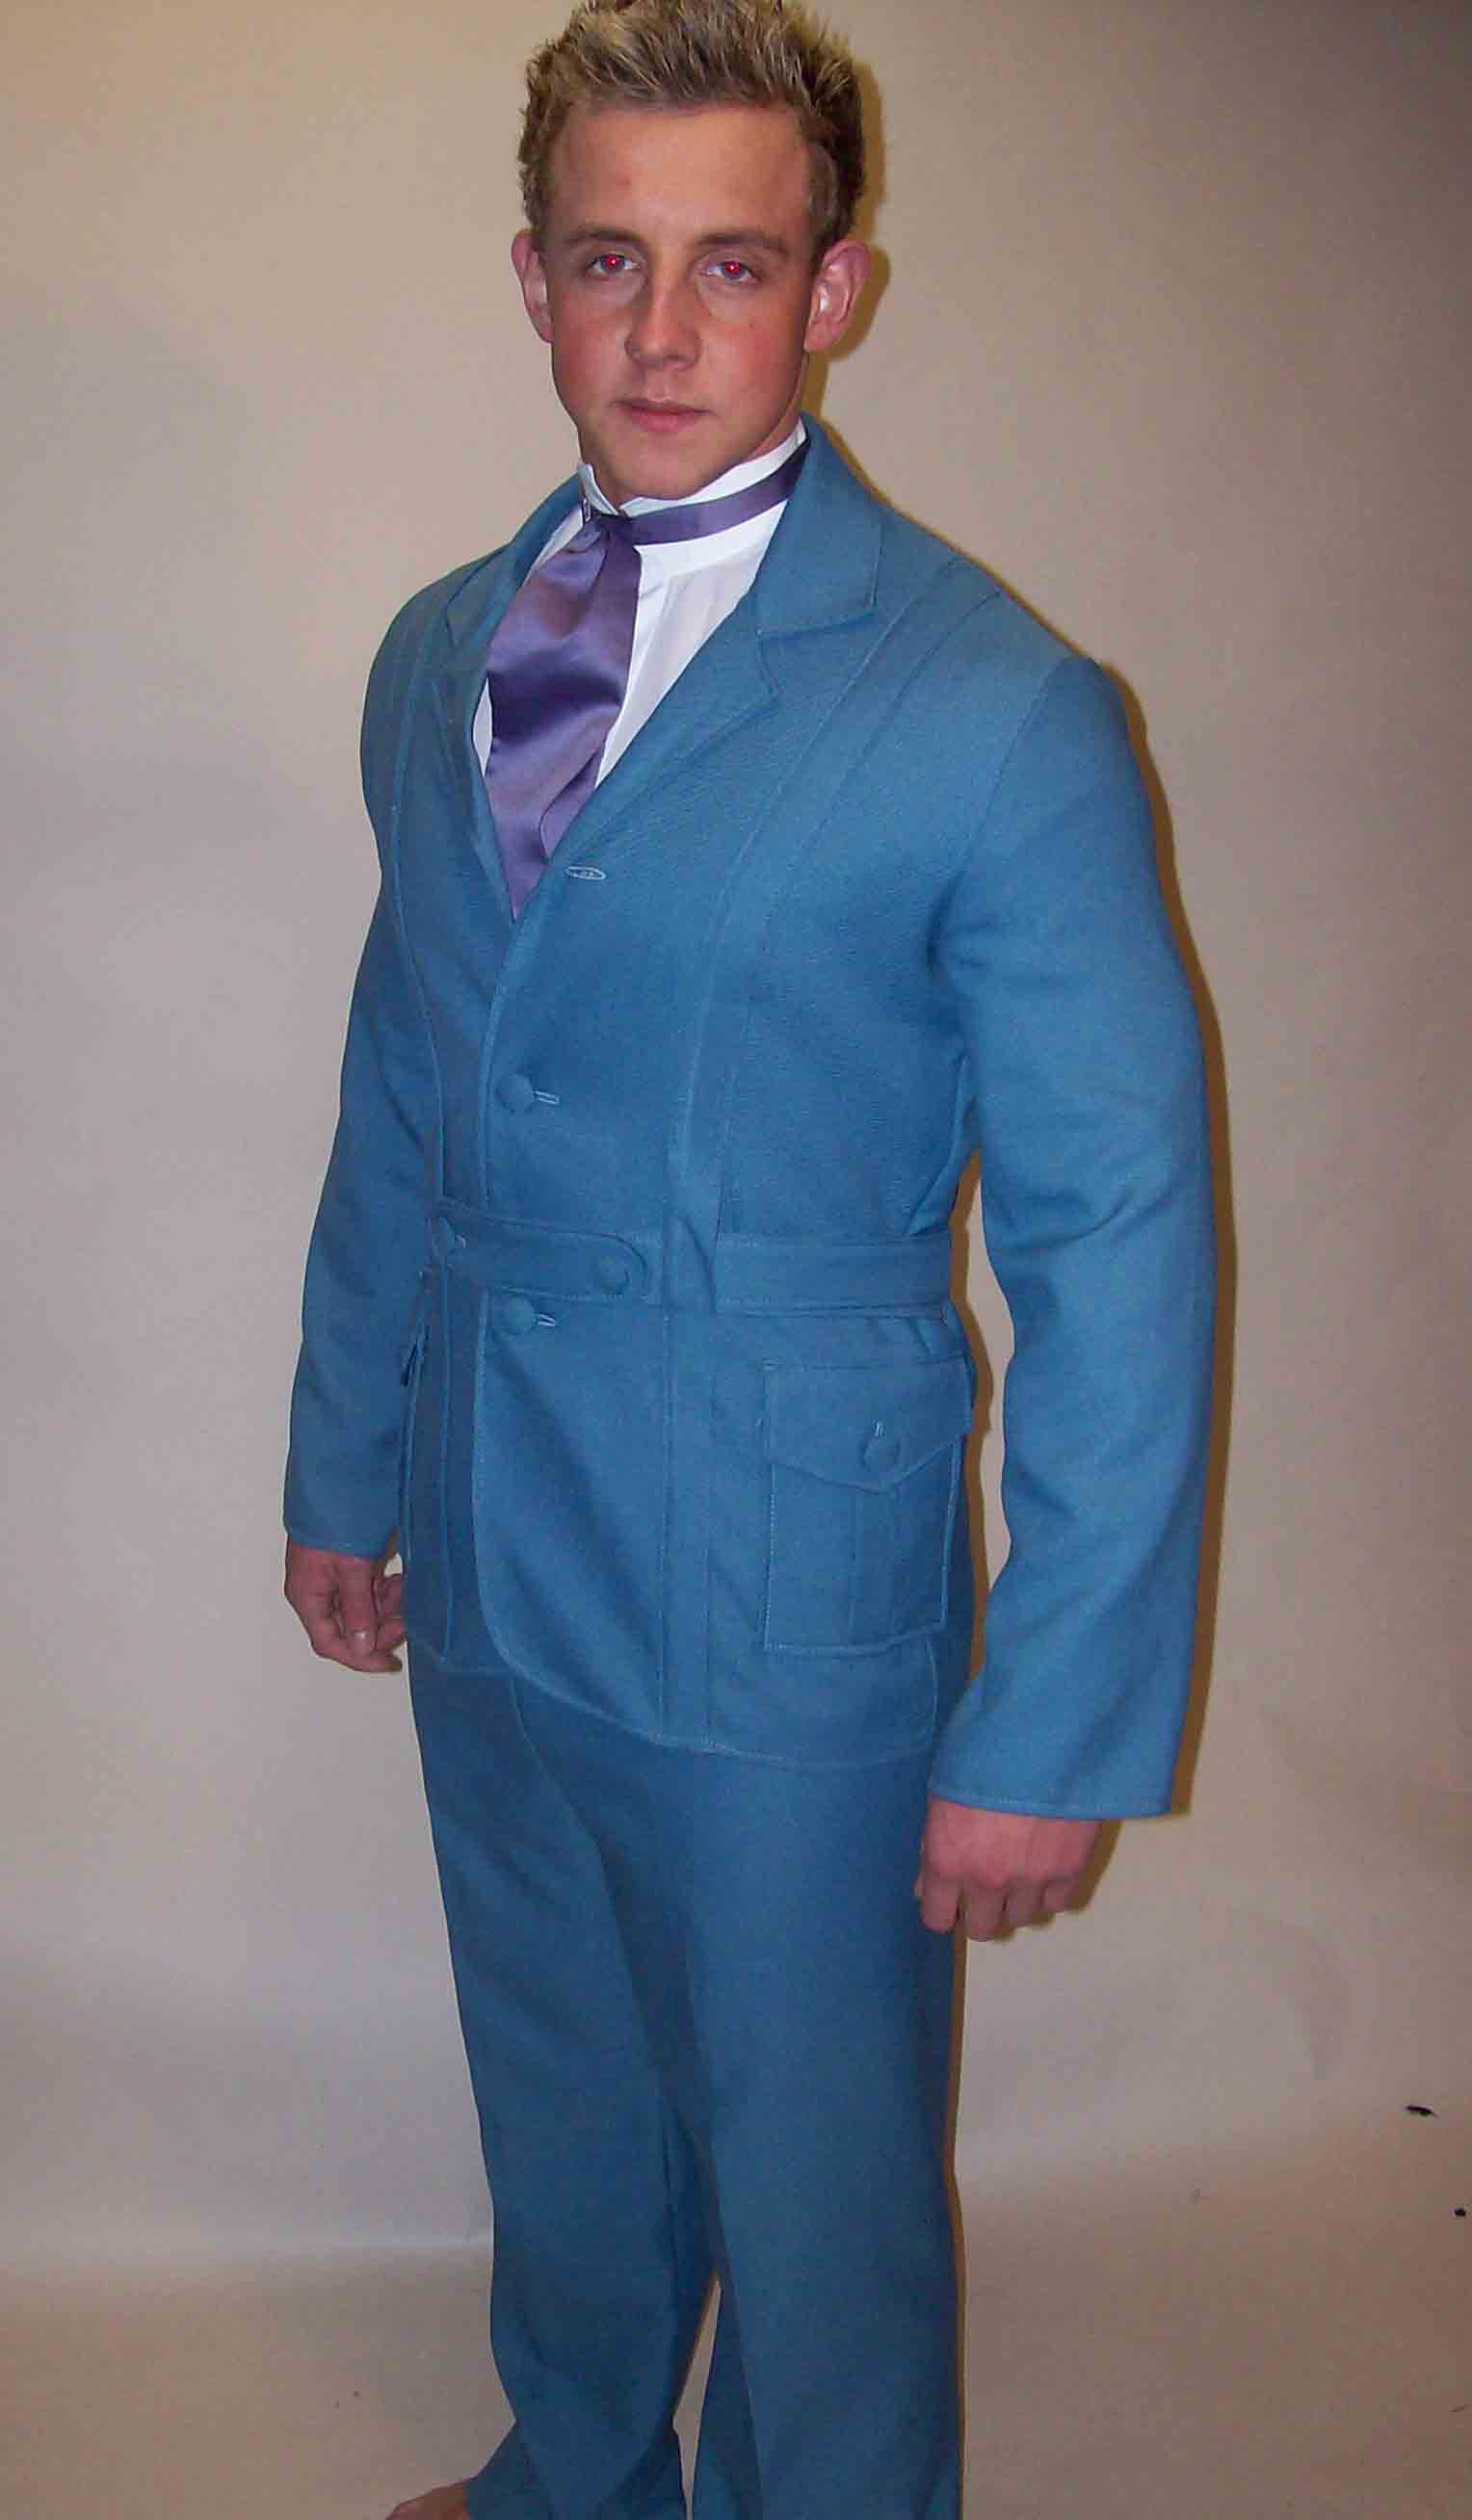 Famous Wedding Suit Hire Worcester Sketch - Wedding Dress Ideas ...